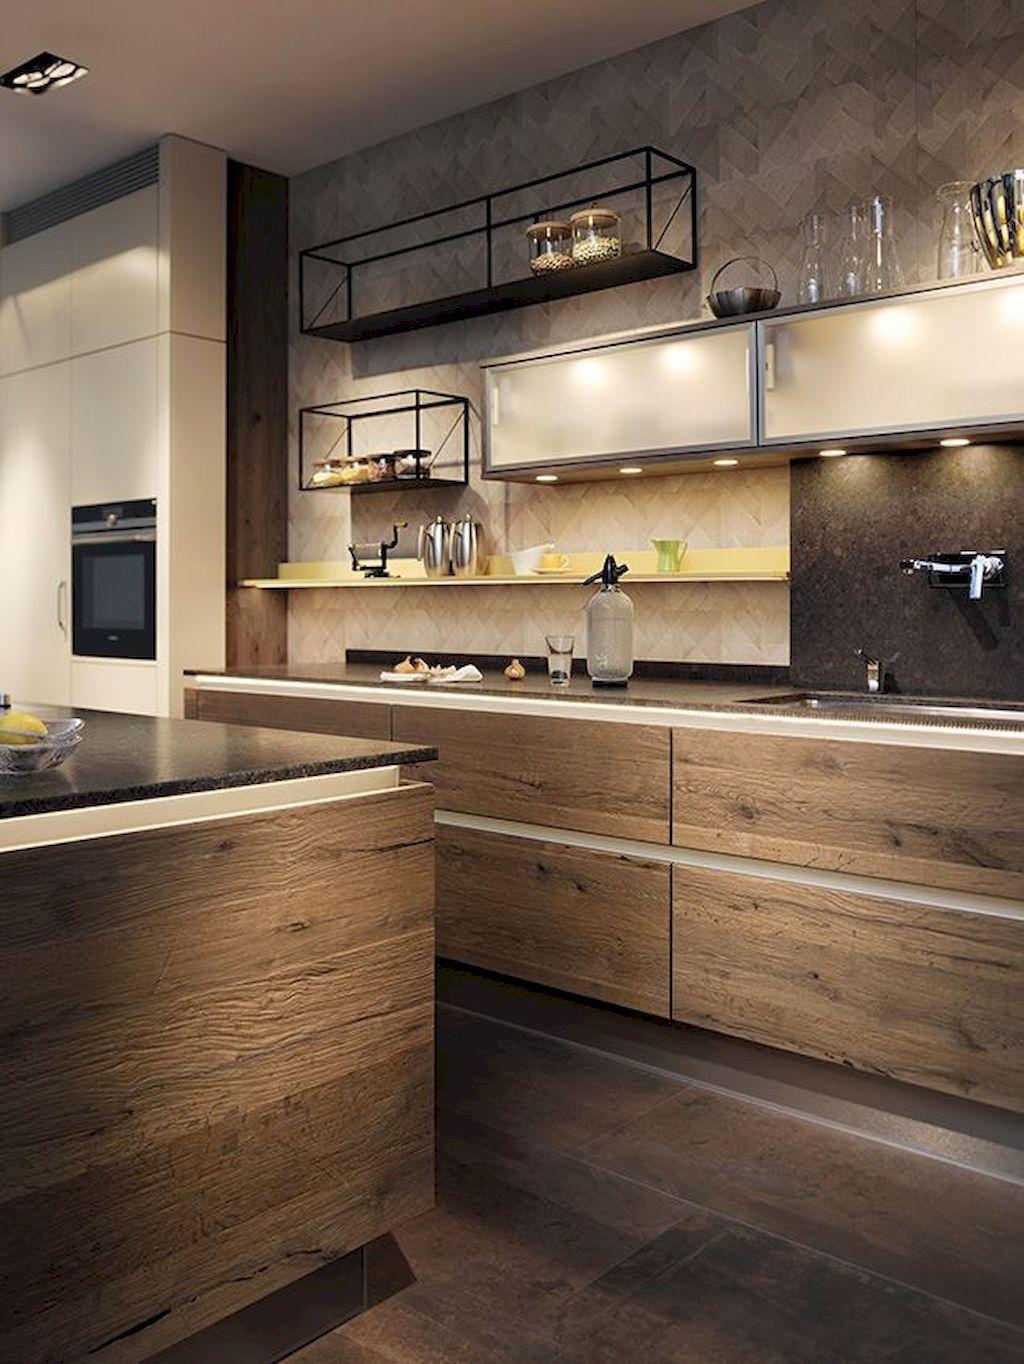 9+ Delicious Minimalist Decor Shelves Ideas   Küche umgestalten ...